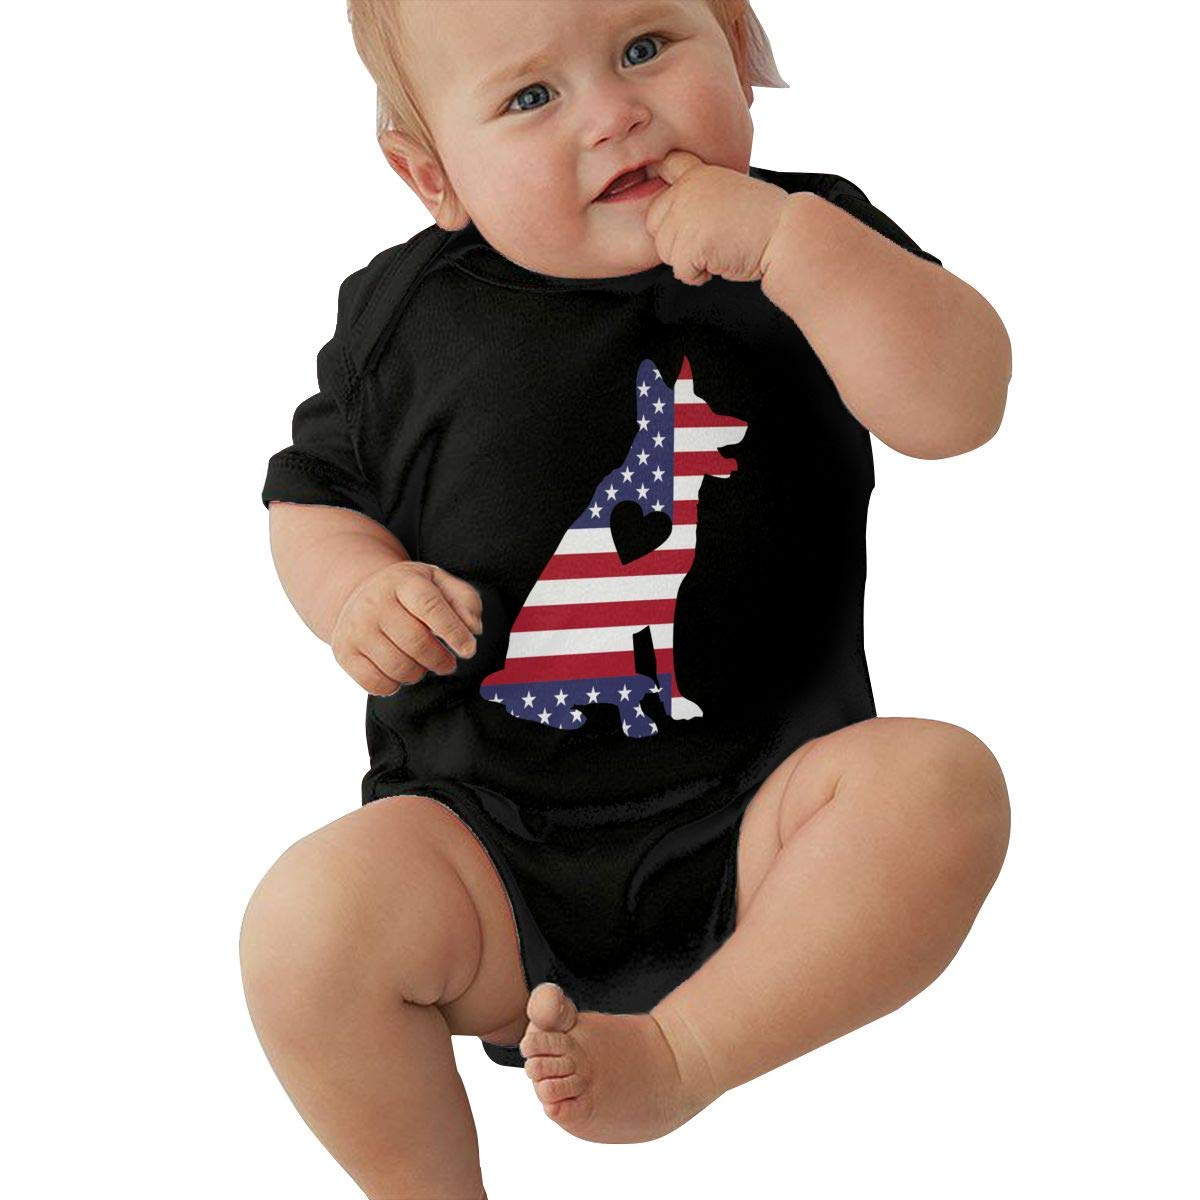 Newborn Baby Girl Boy German Shepherd Heart USA Flag Outfit Romper Jumpsuit Short Sleeve Bodysuit Tops Clothes